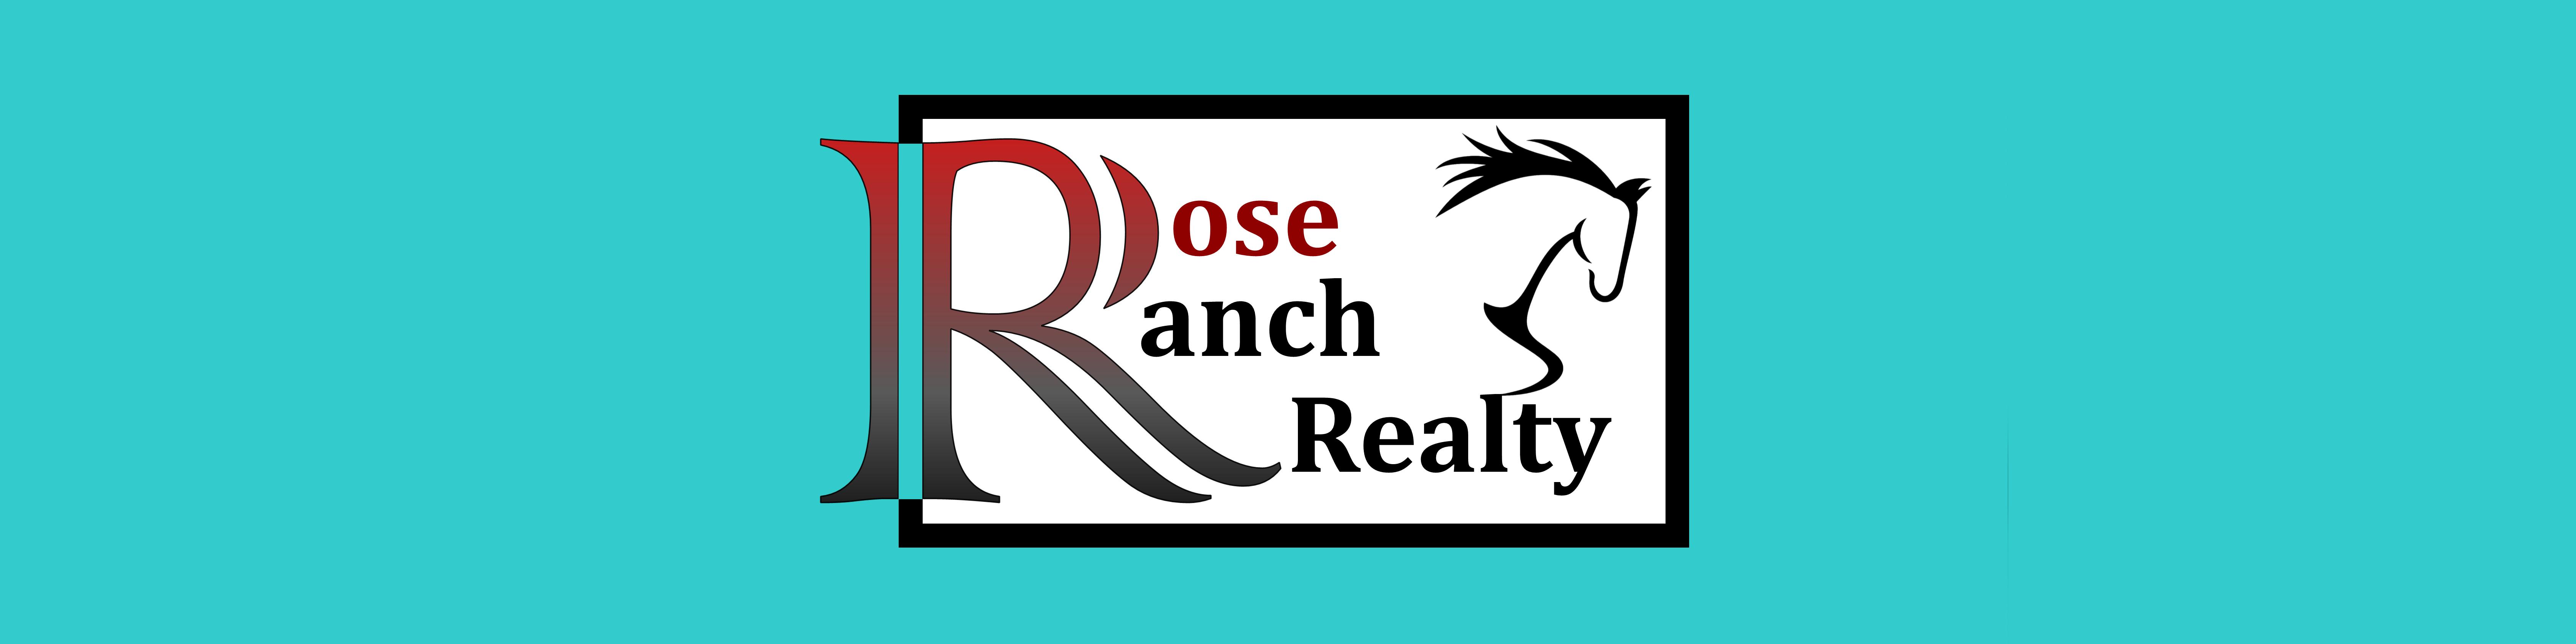 Rose Ranch Realty